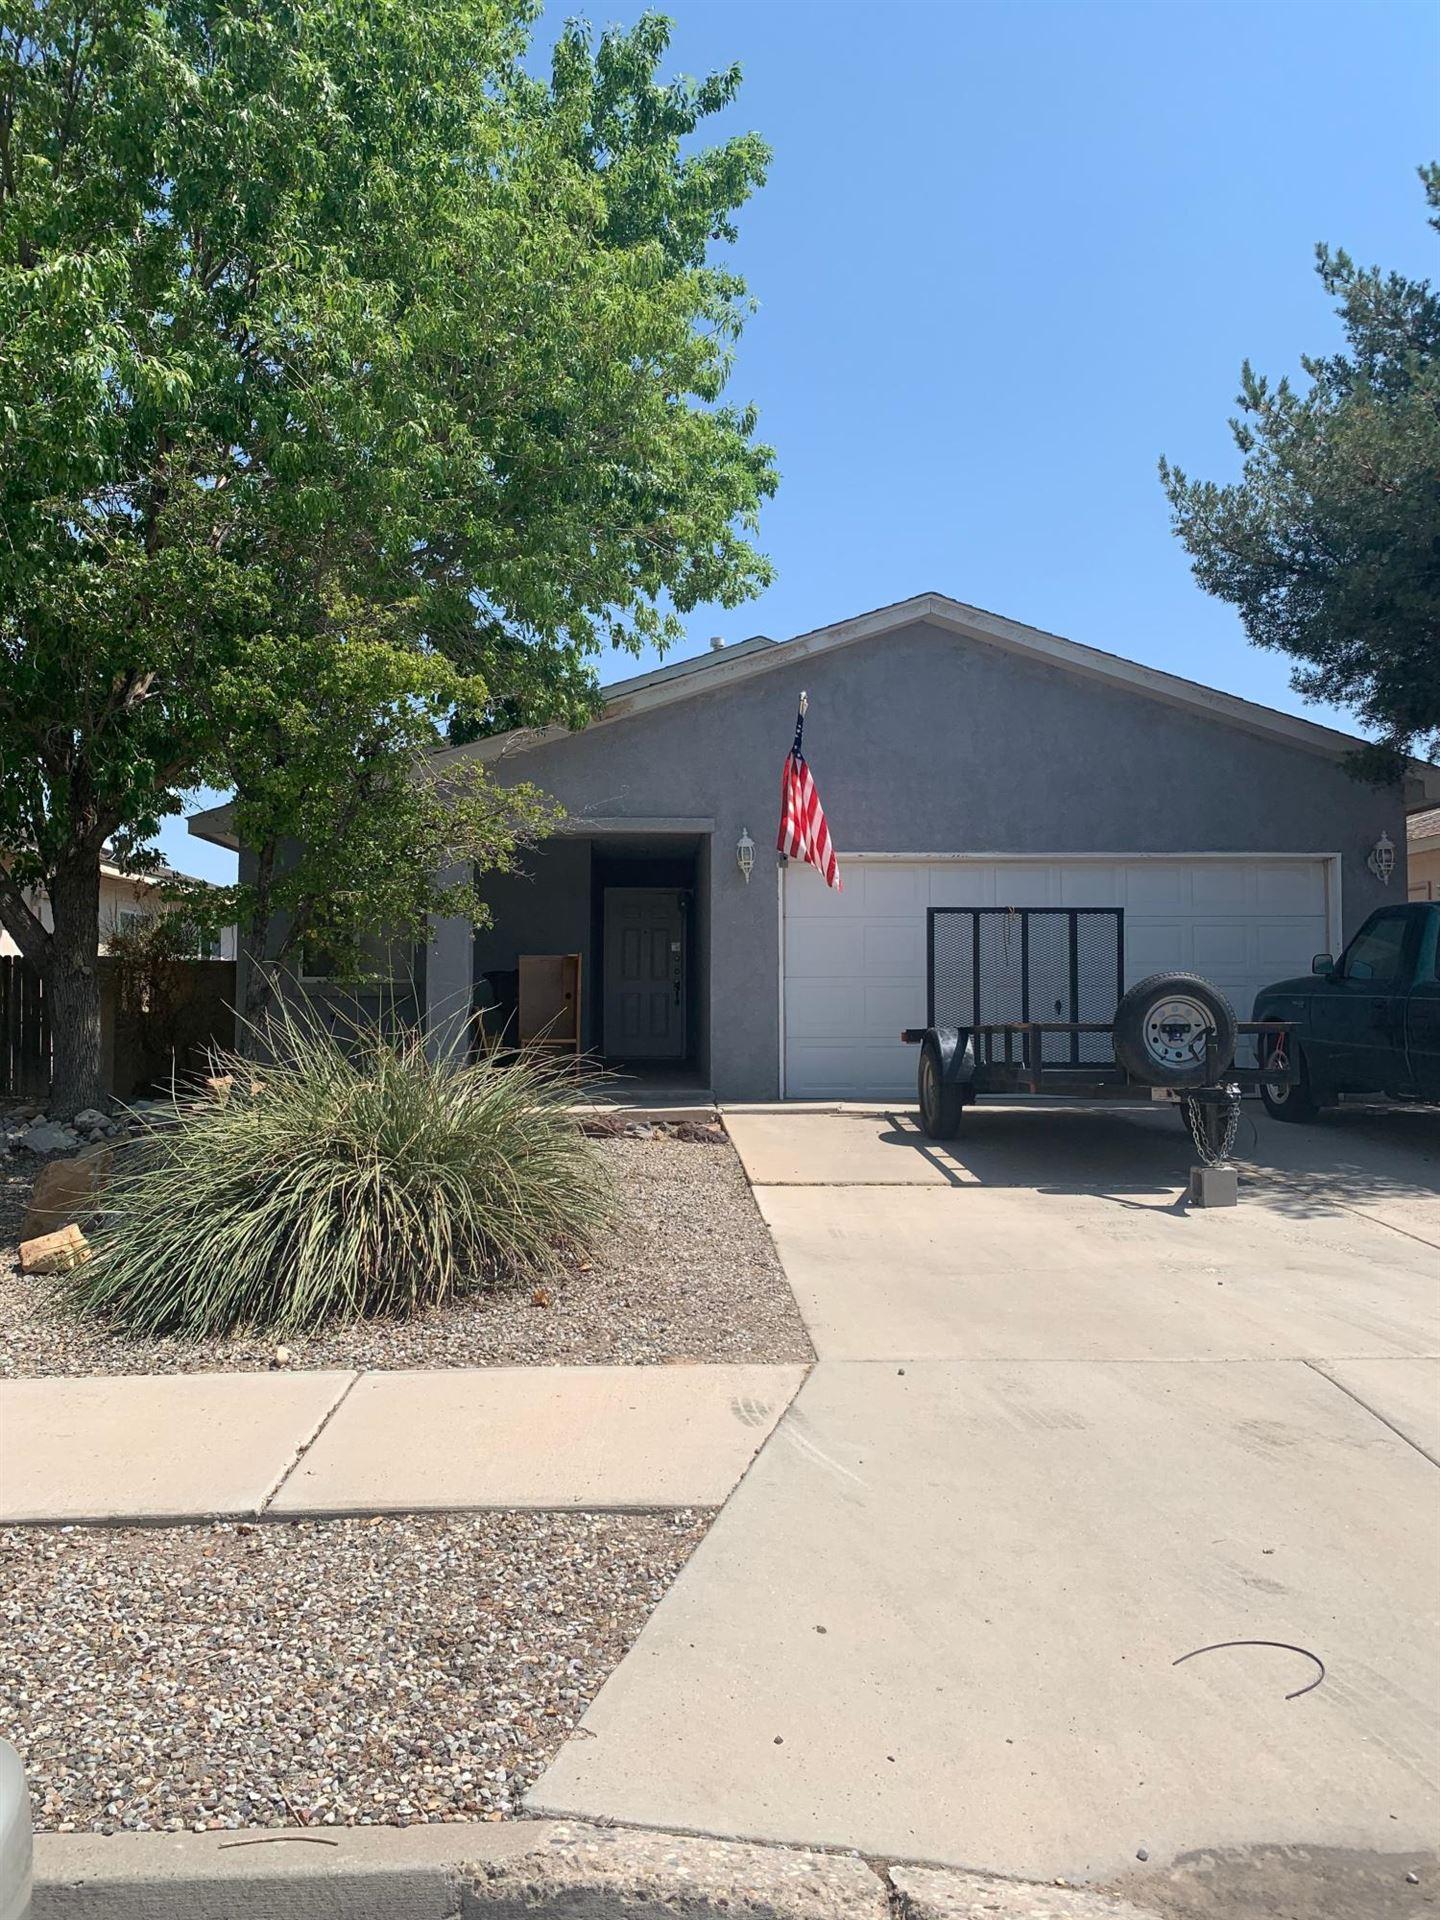 Photo of 3008 WINSTON MEADOWS Drive NE, Rio Rancho, NM 87144 (MLS # 989760)